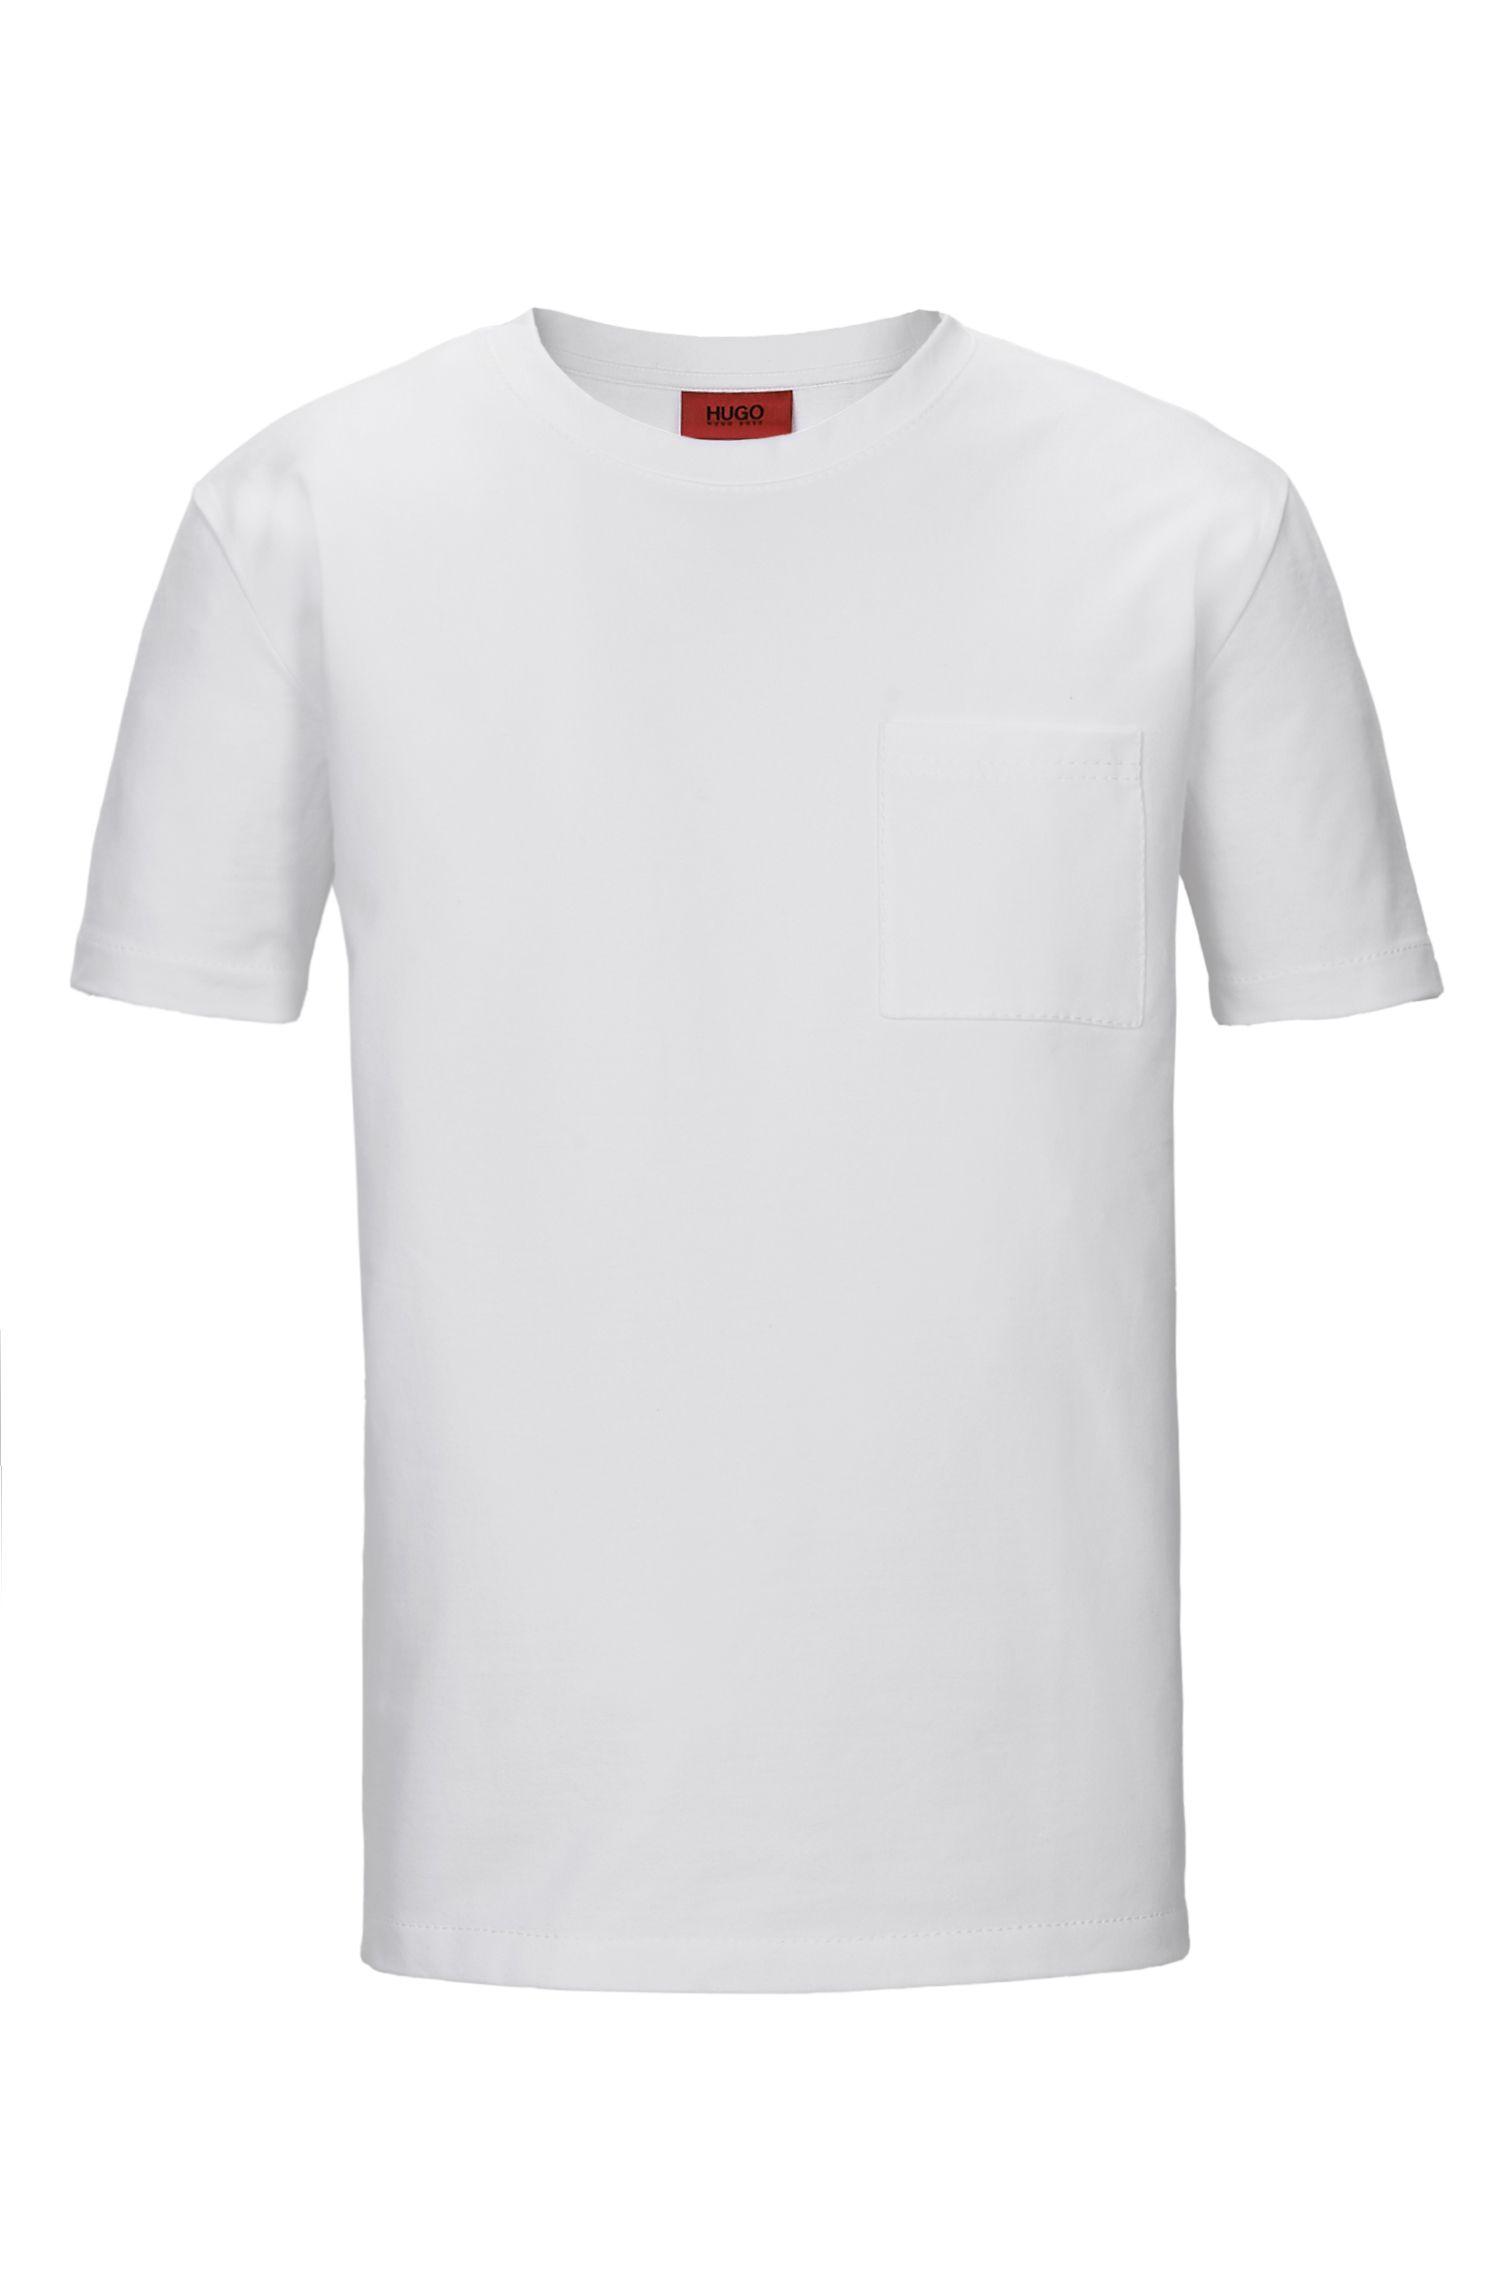 Stretch French Terry Pocket T-Shirt | Daccor